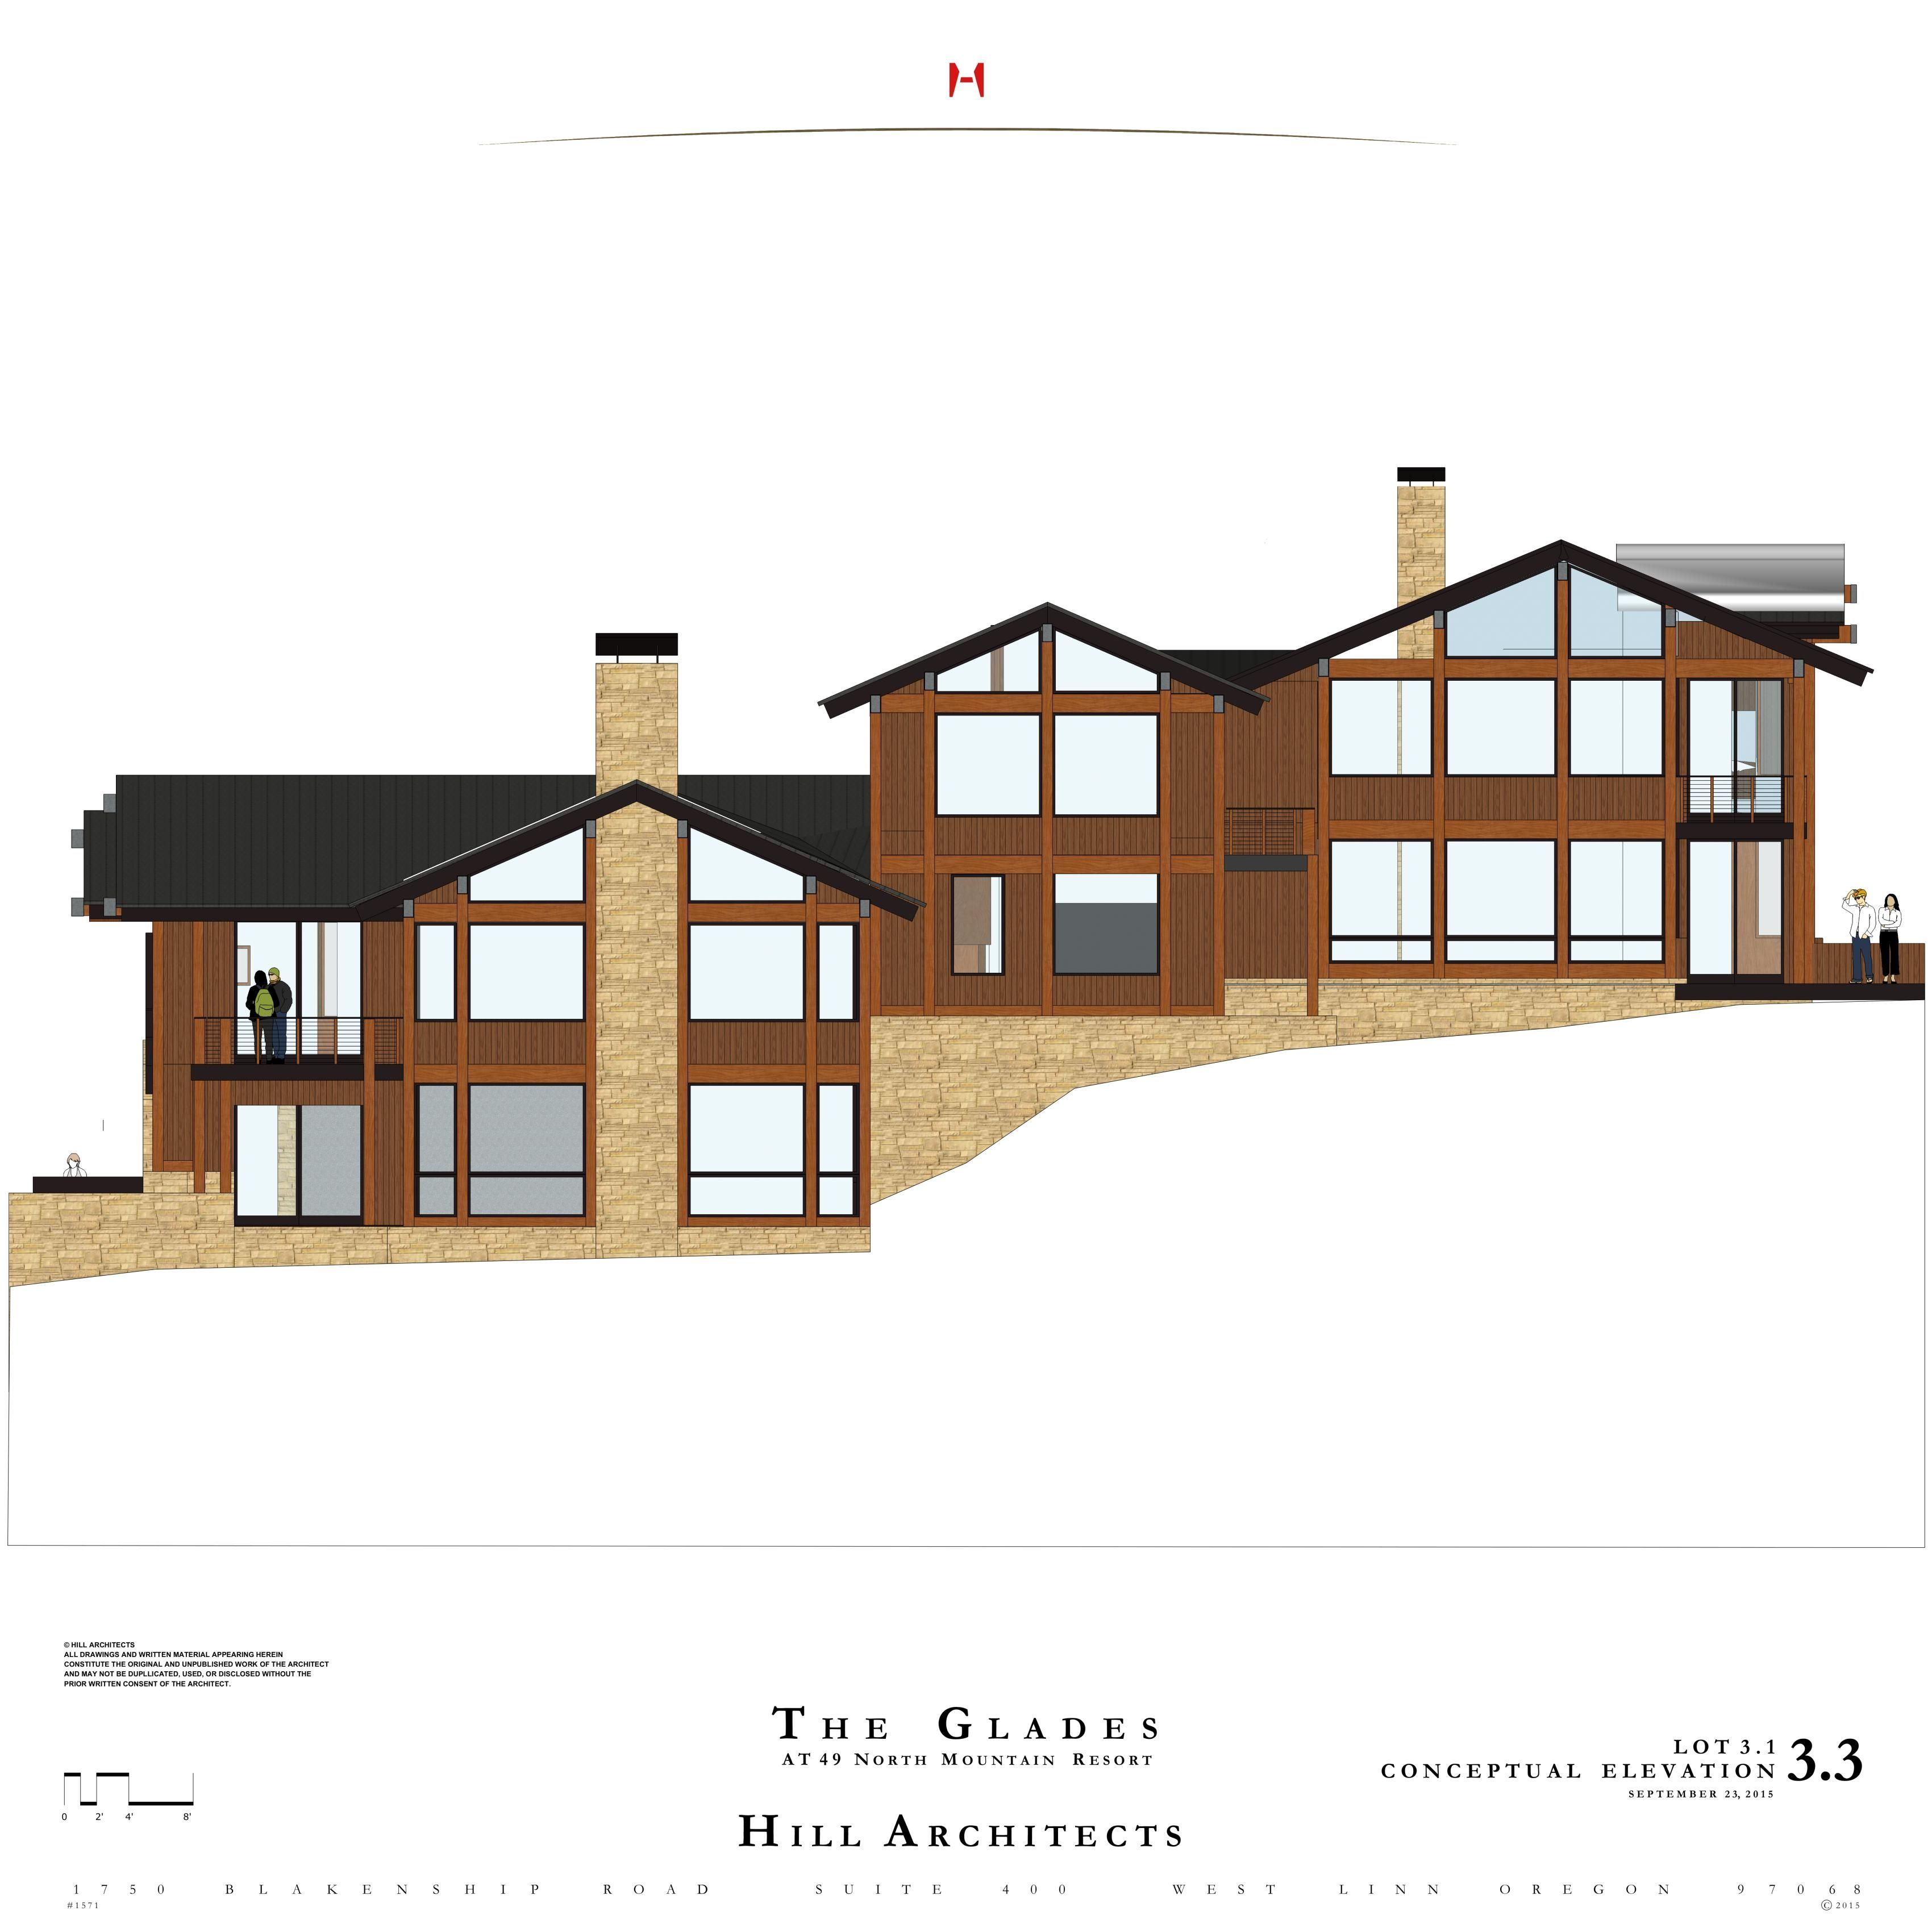 Mountain side house floor plans httpviajesairmar house malvernweather Choice Image